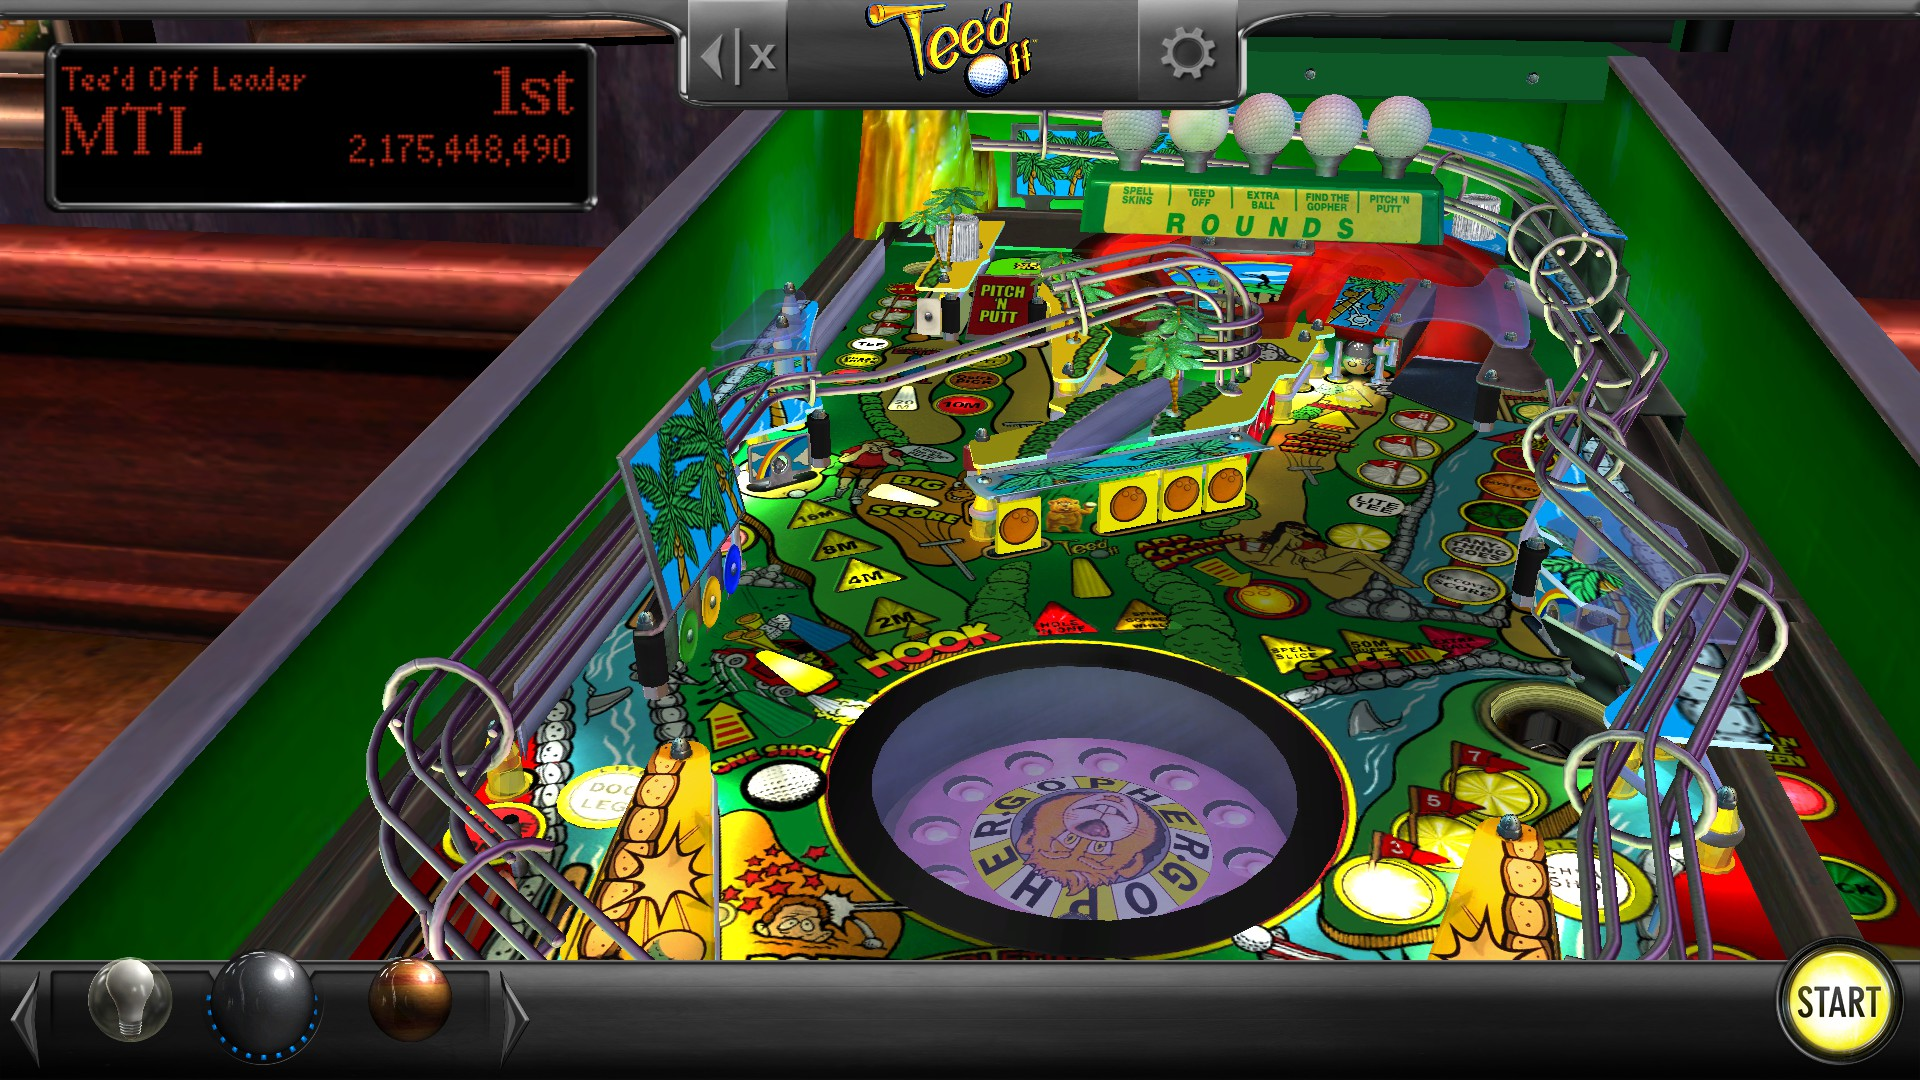 Mantalow: Pinball Arcade: Tee